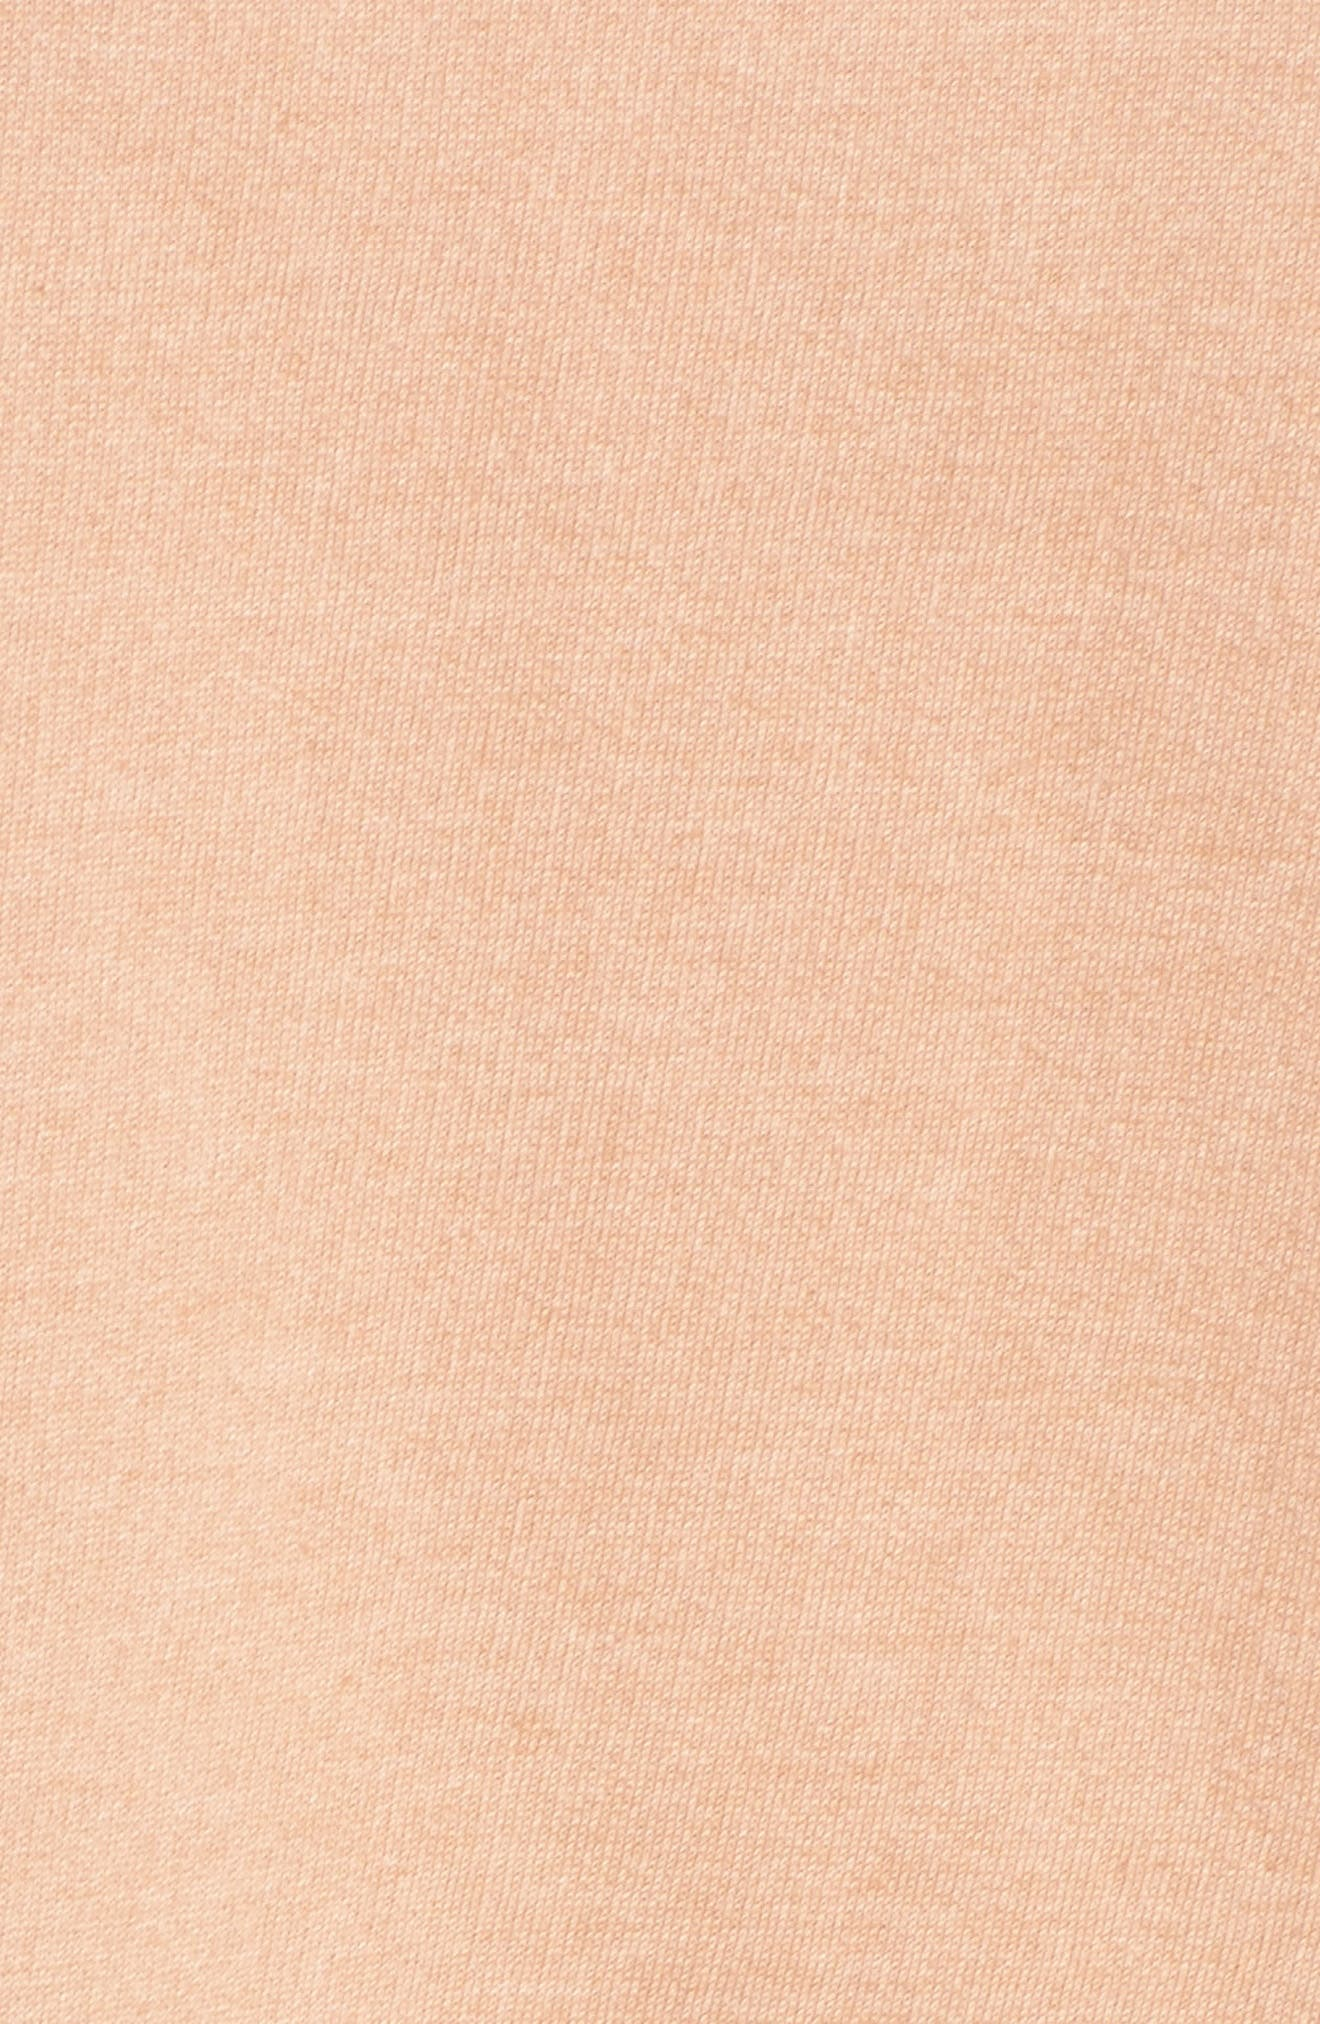 Middle Sister Brunette Sweatshirt,                             Alternate thumbnail 5, color,                             950